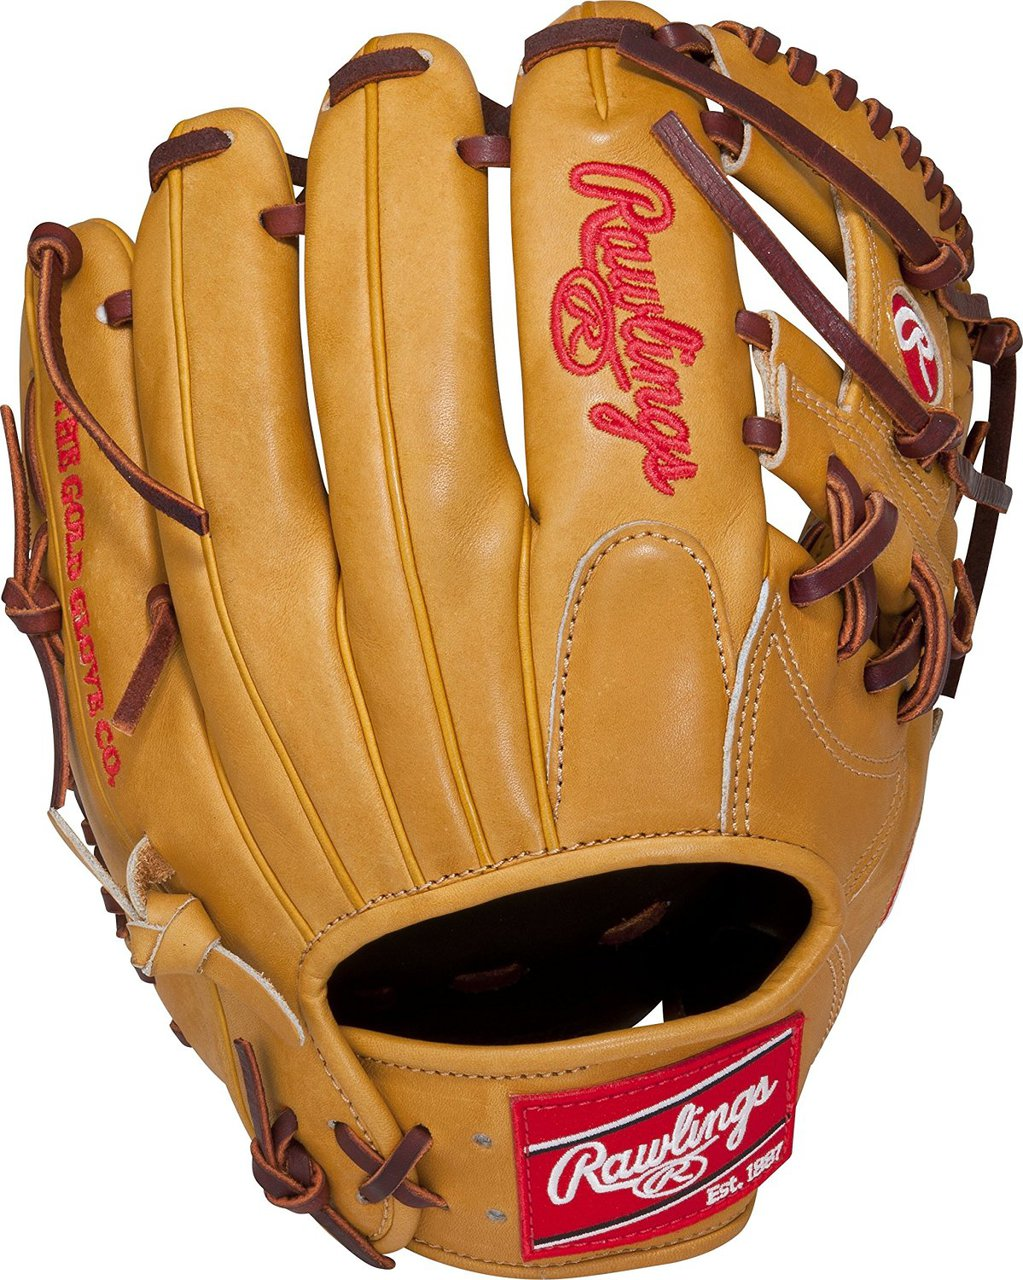 rawlings-heart-of-the-hide-11-1-4-baseball-glove-right-hand-throw PRONP2-2BU-RightHandThrow Rawlings 083321177132 Heart of the Hide is one of the most classic glove